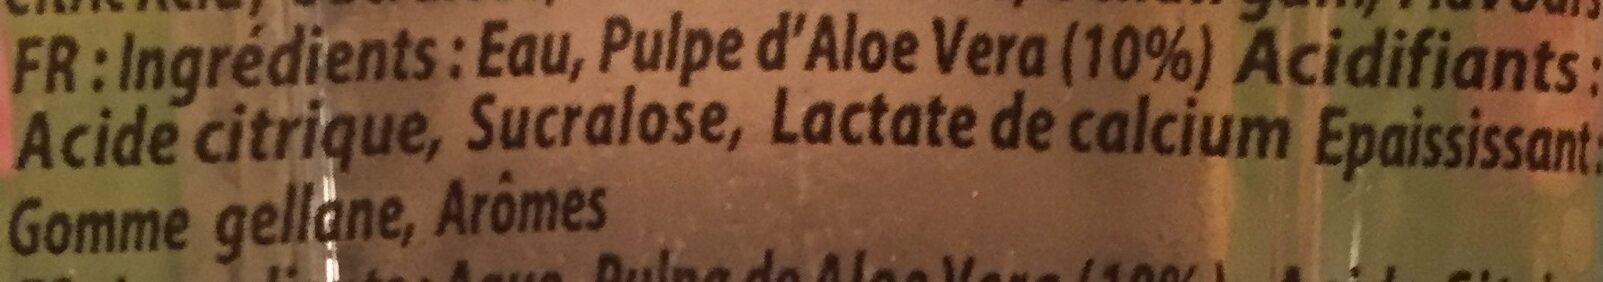 Aloe light - Ingredients - fr